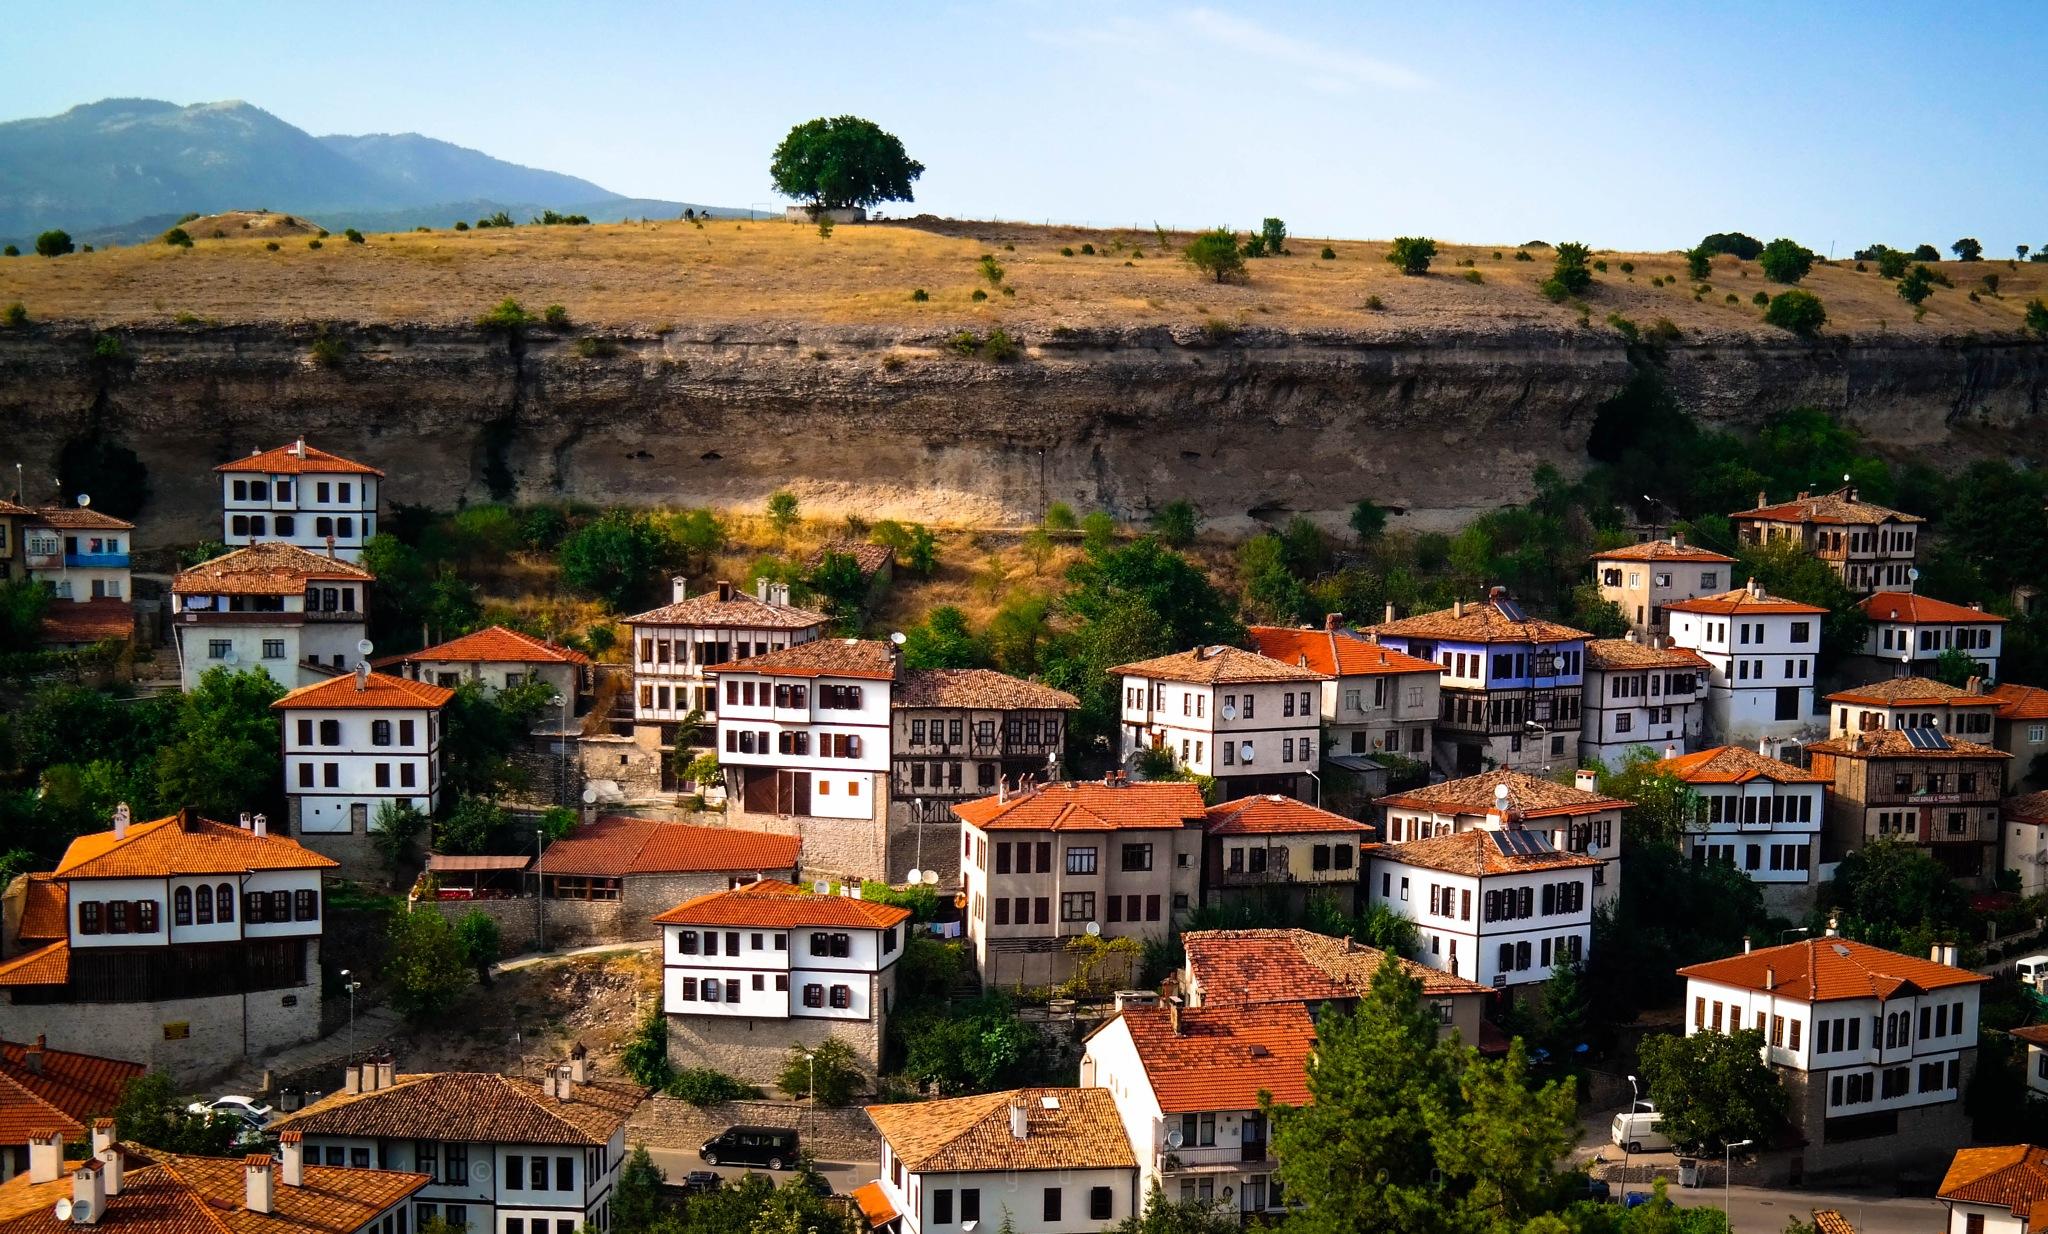 Tepe by Guzel Sarigul